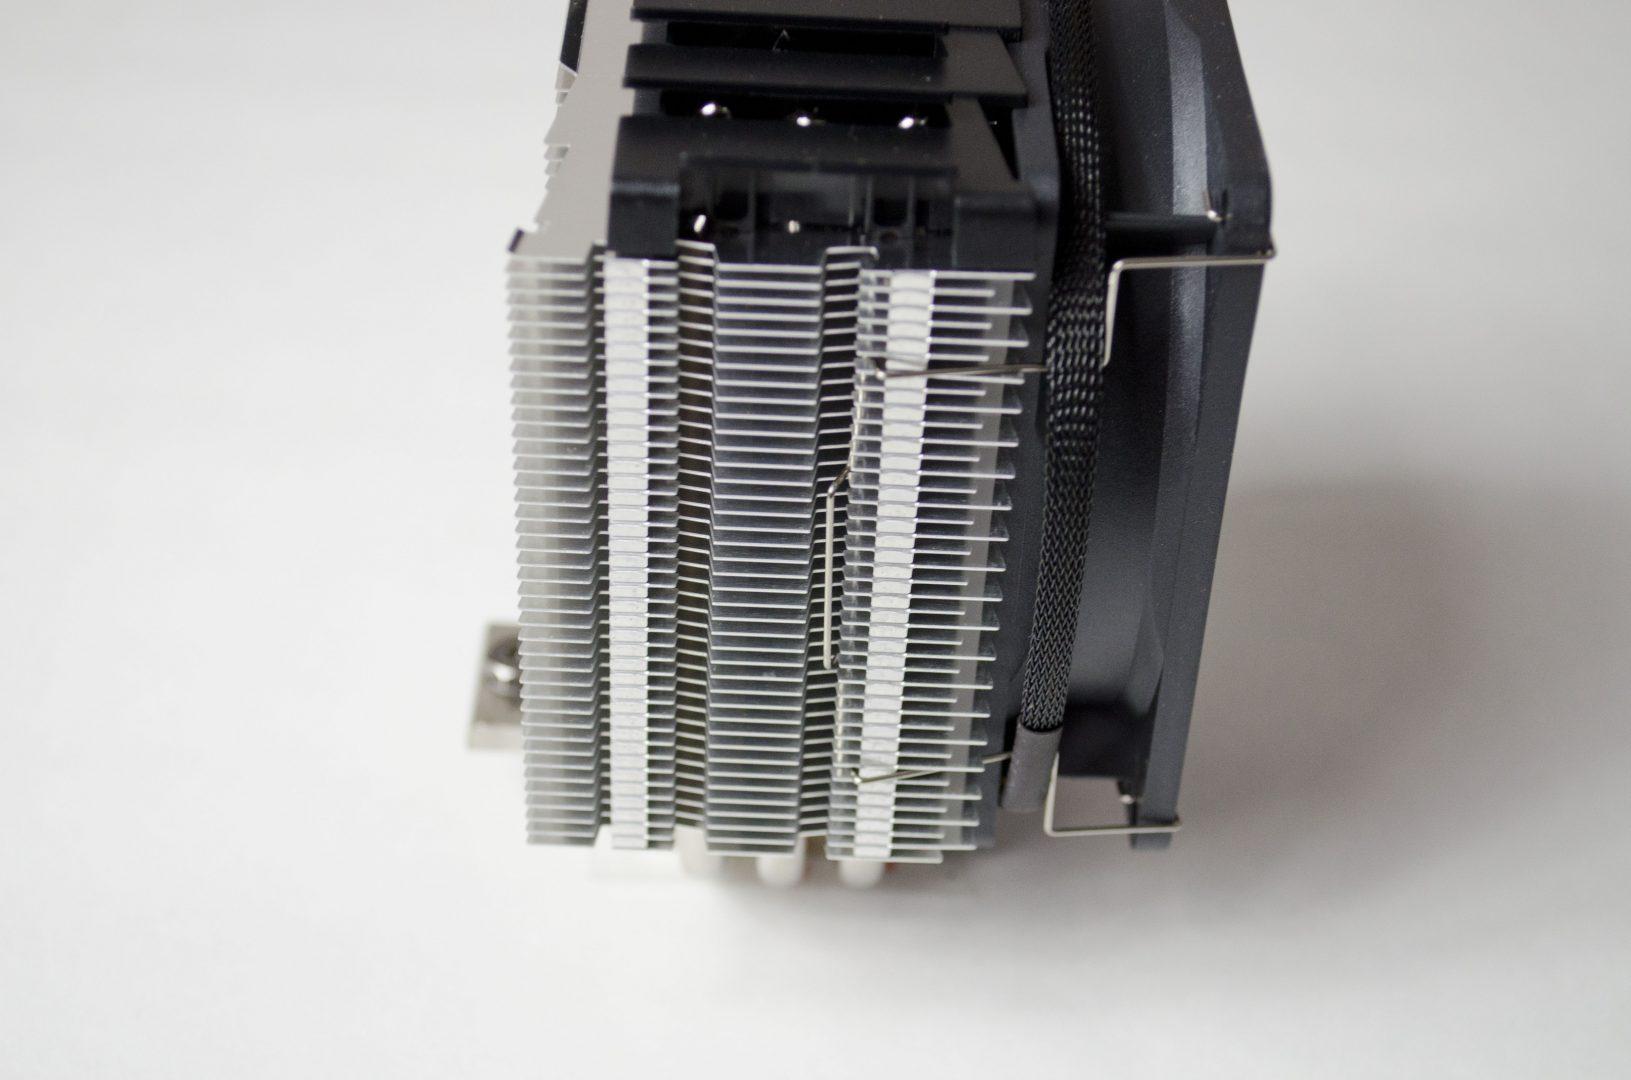 cryorig m9i cpu cooler review_5